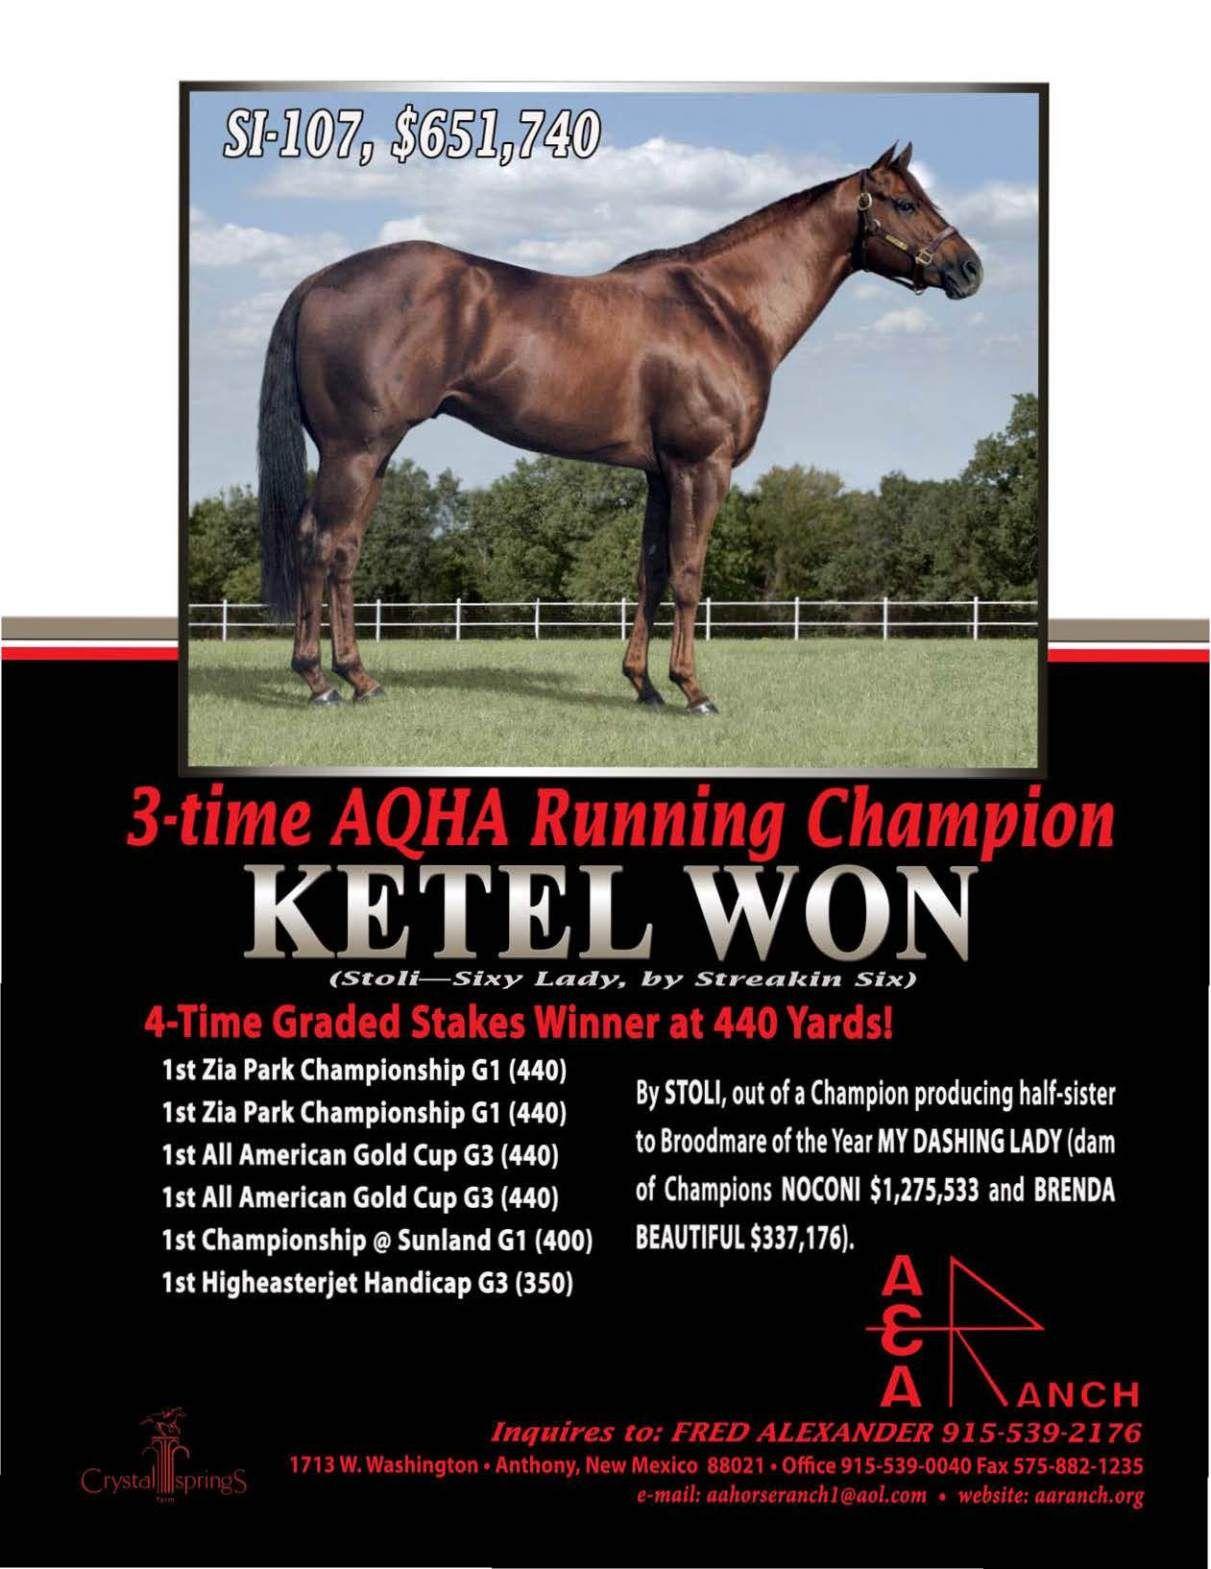 Ketel won2003stoli sixy lady by streaking six 5x5 to